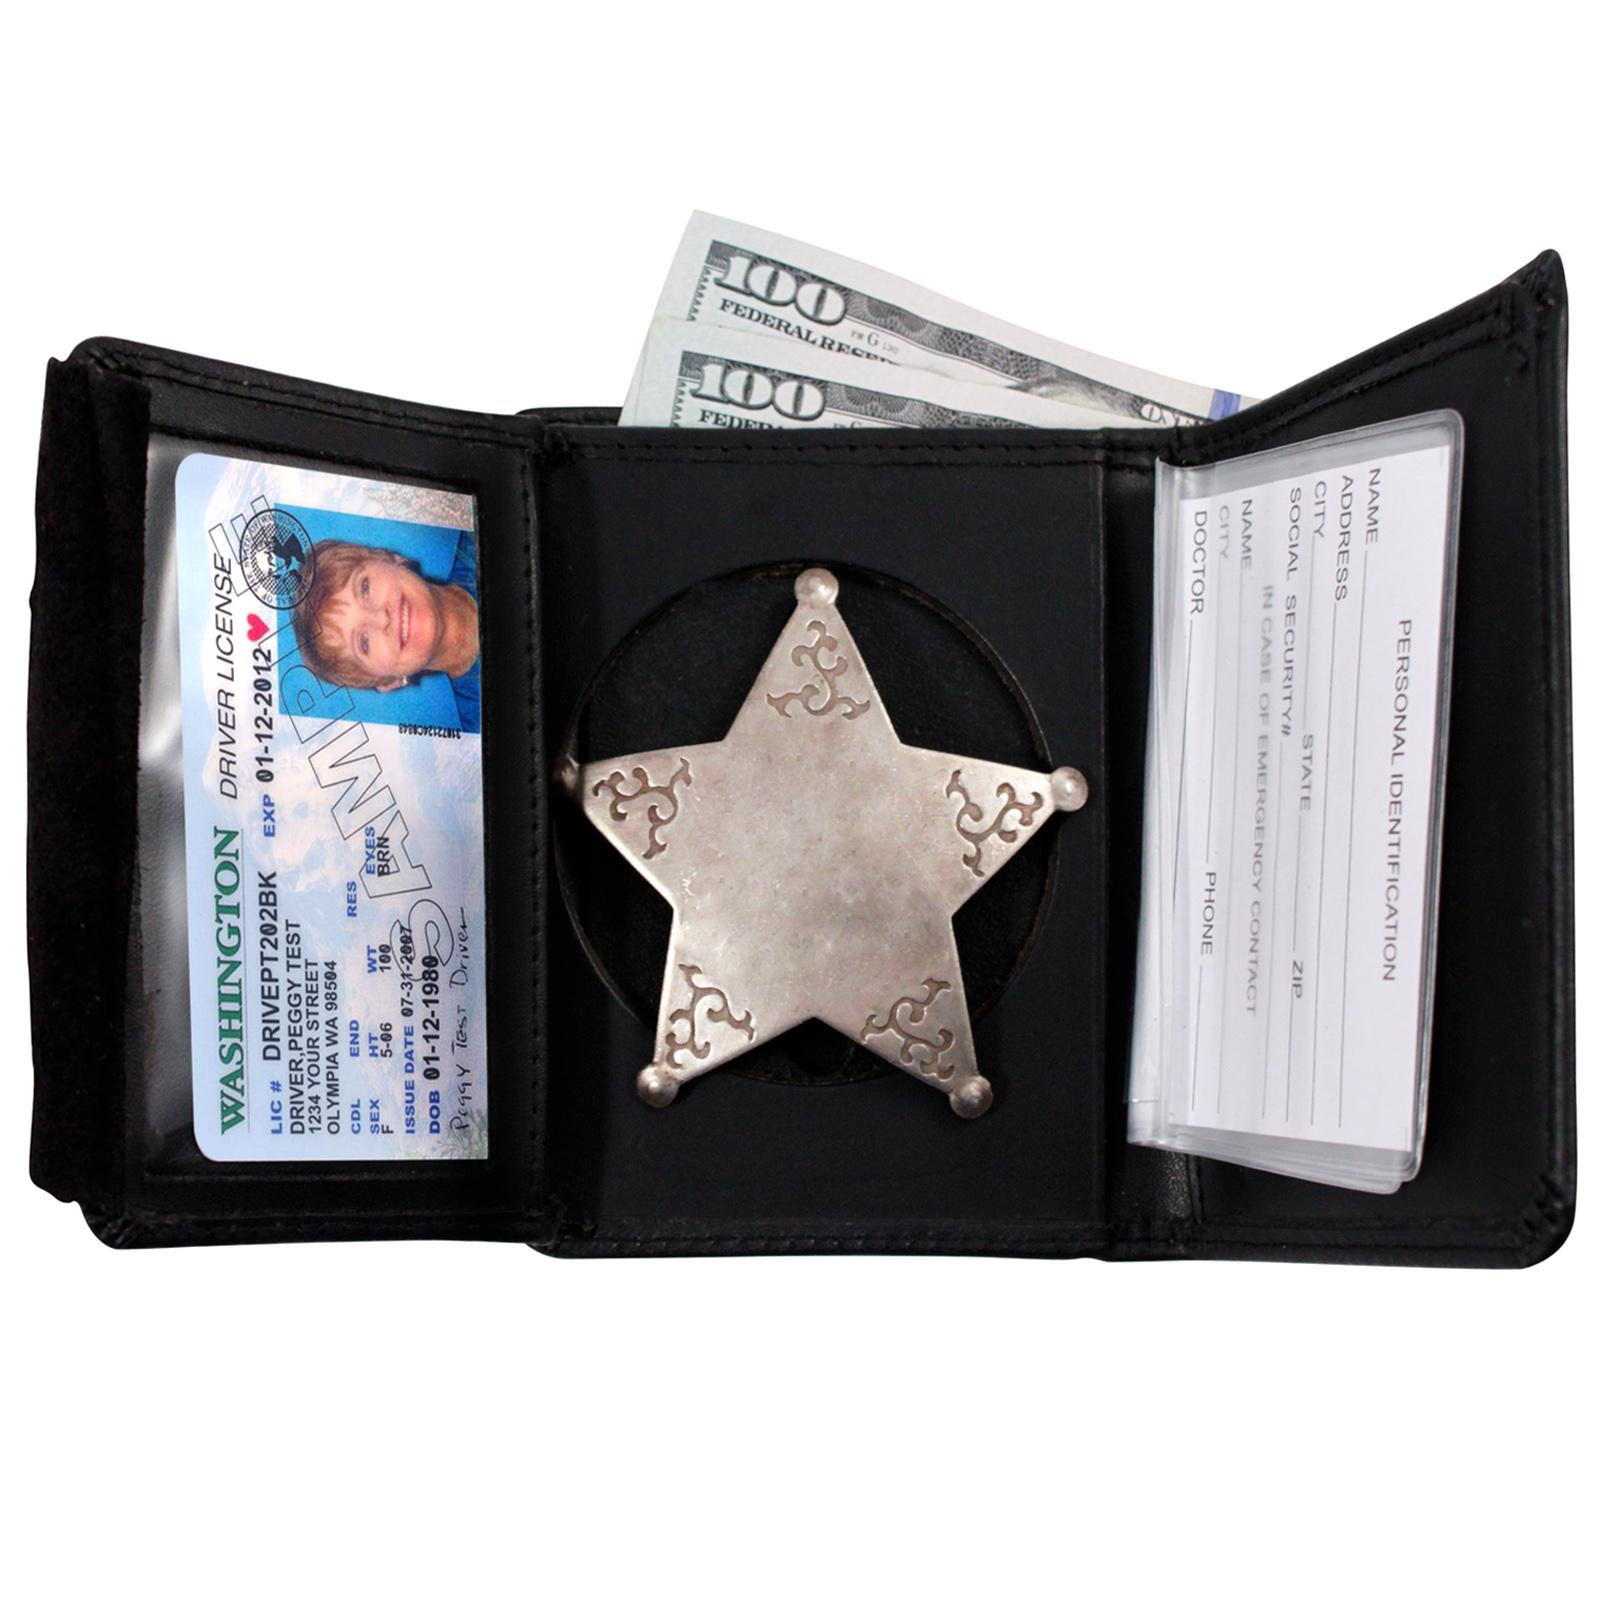 ASR Federal Law Enforcement Leather Hidden Badge RFID Wallet - Round